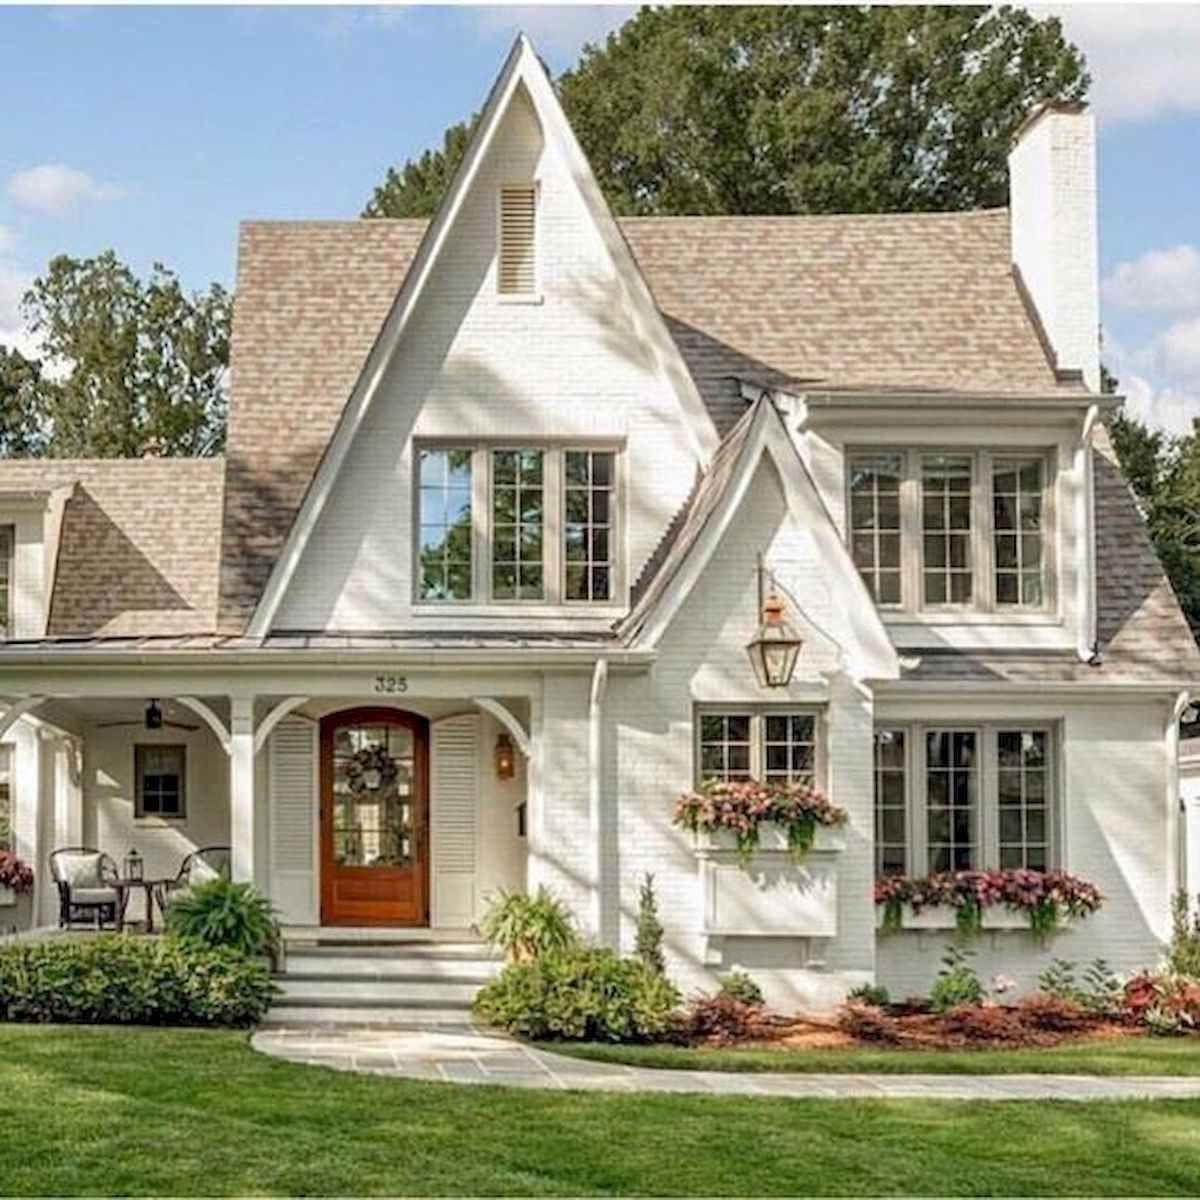 40 Fantastic Dream Home Exterior Design Ideas (7